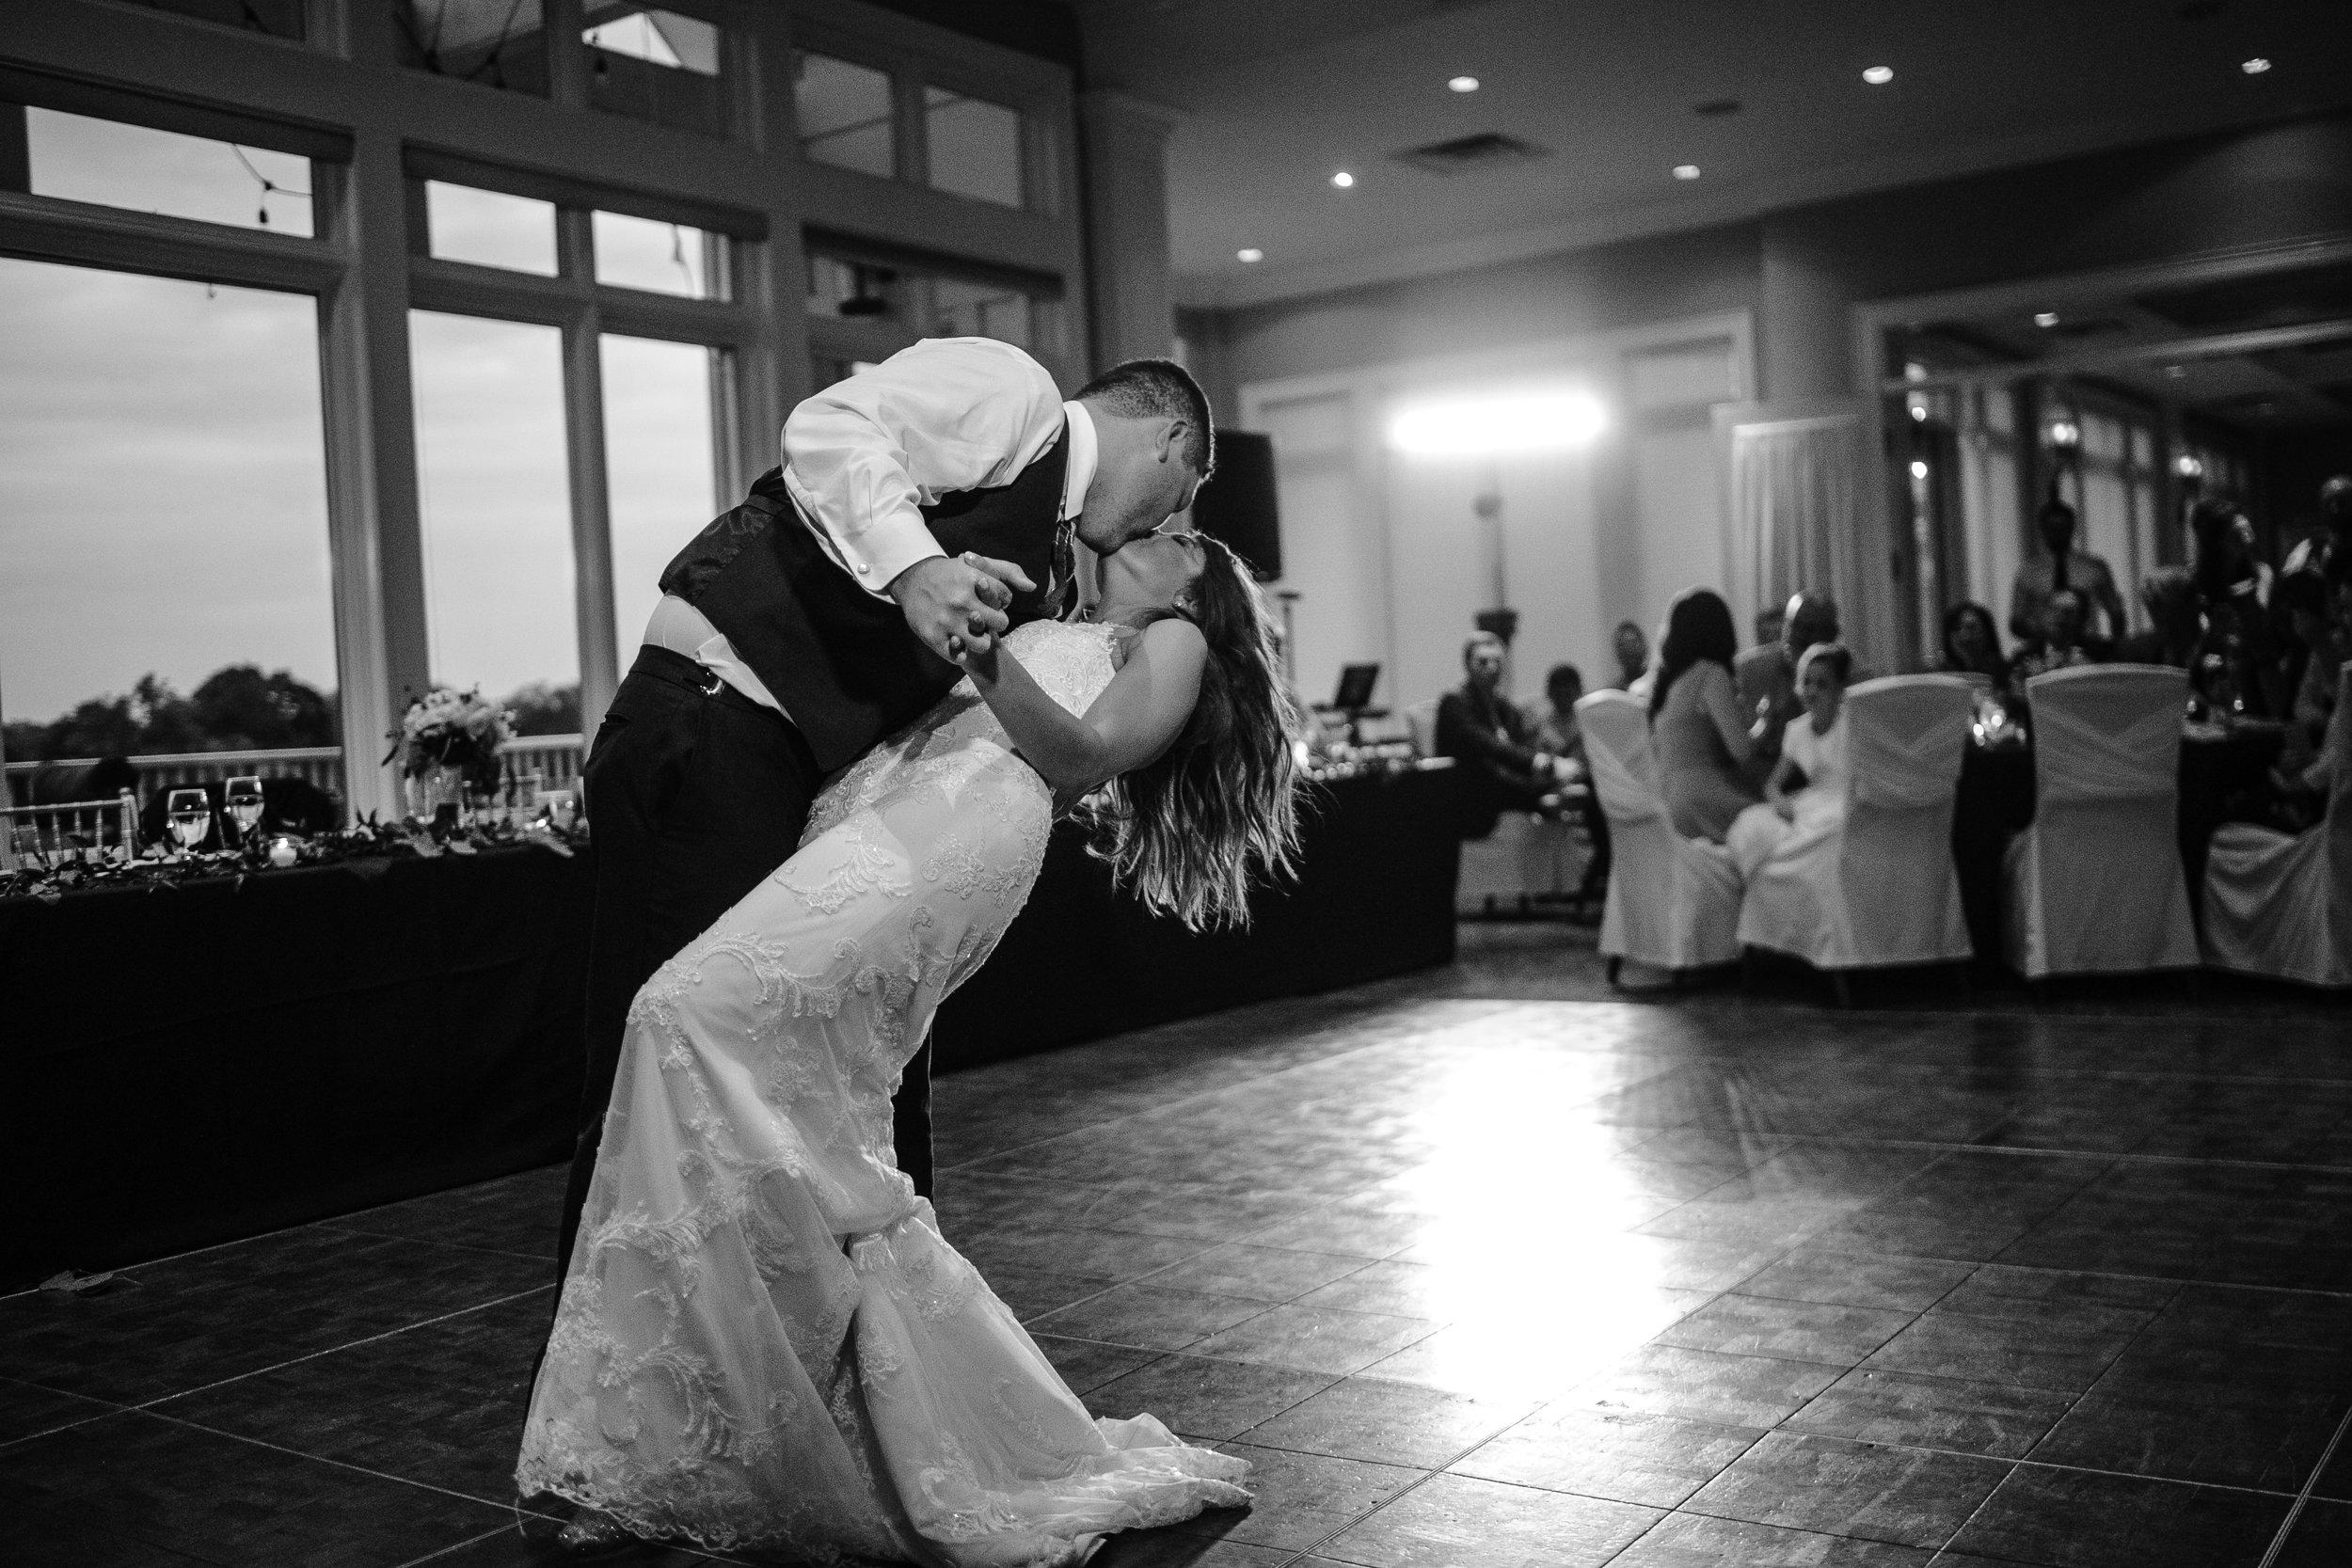 Wedding-dip-during-first-dance.jpg